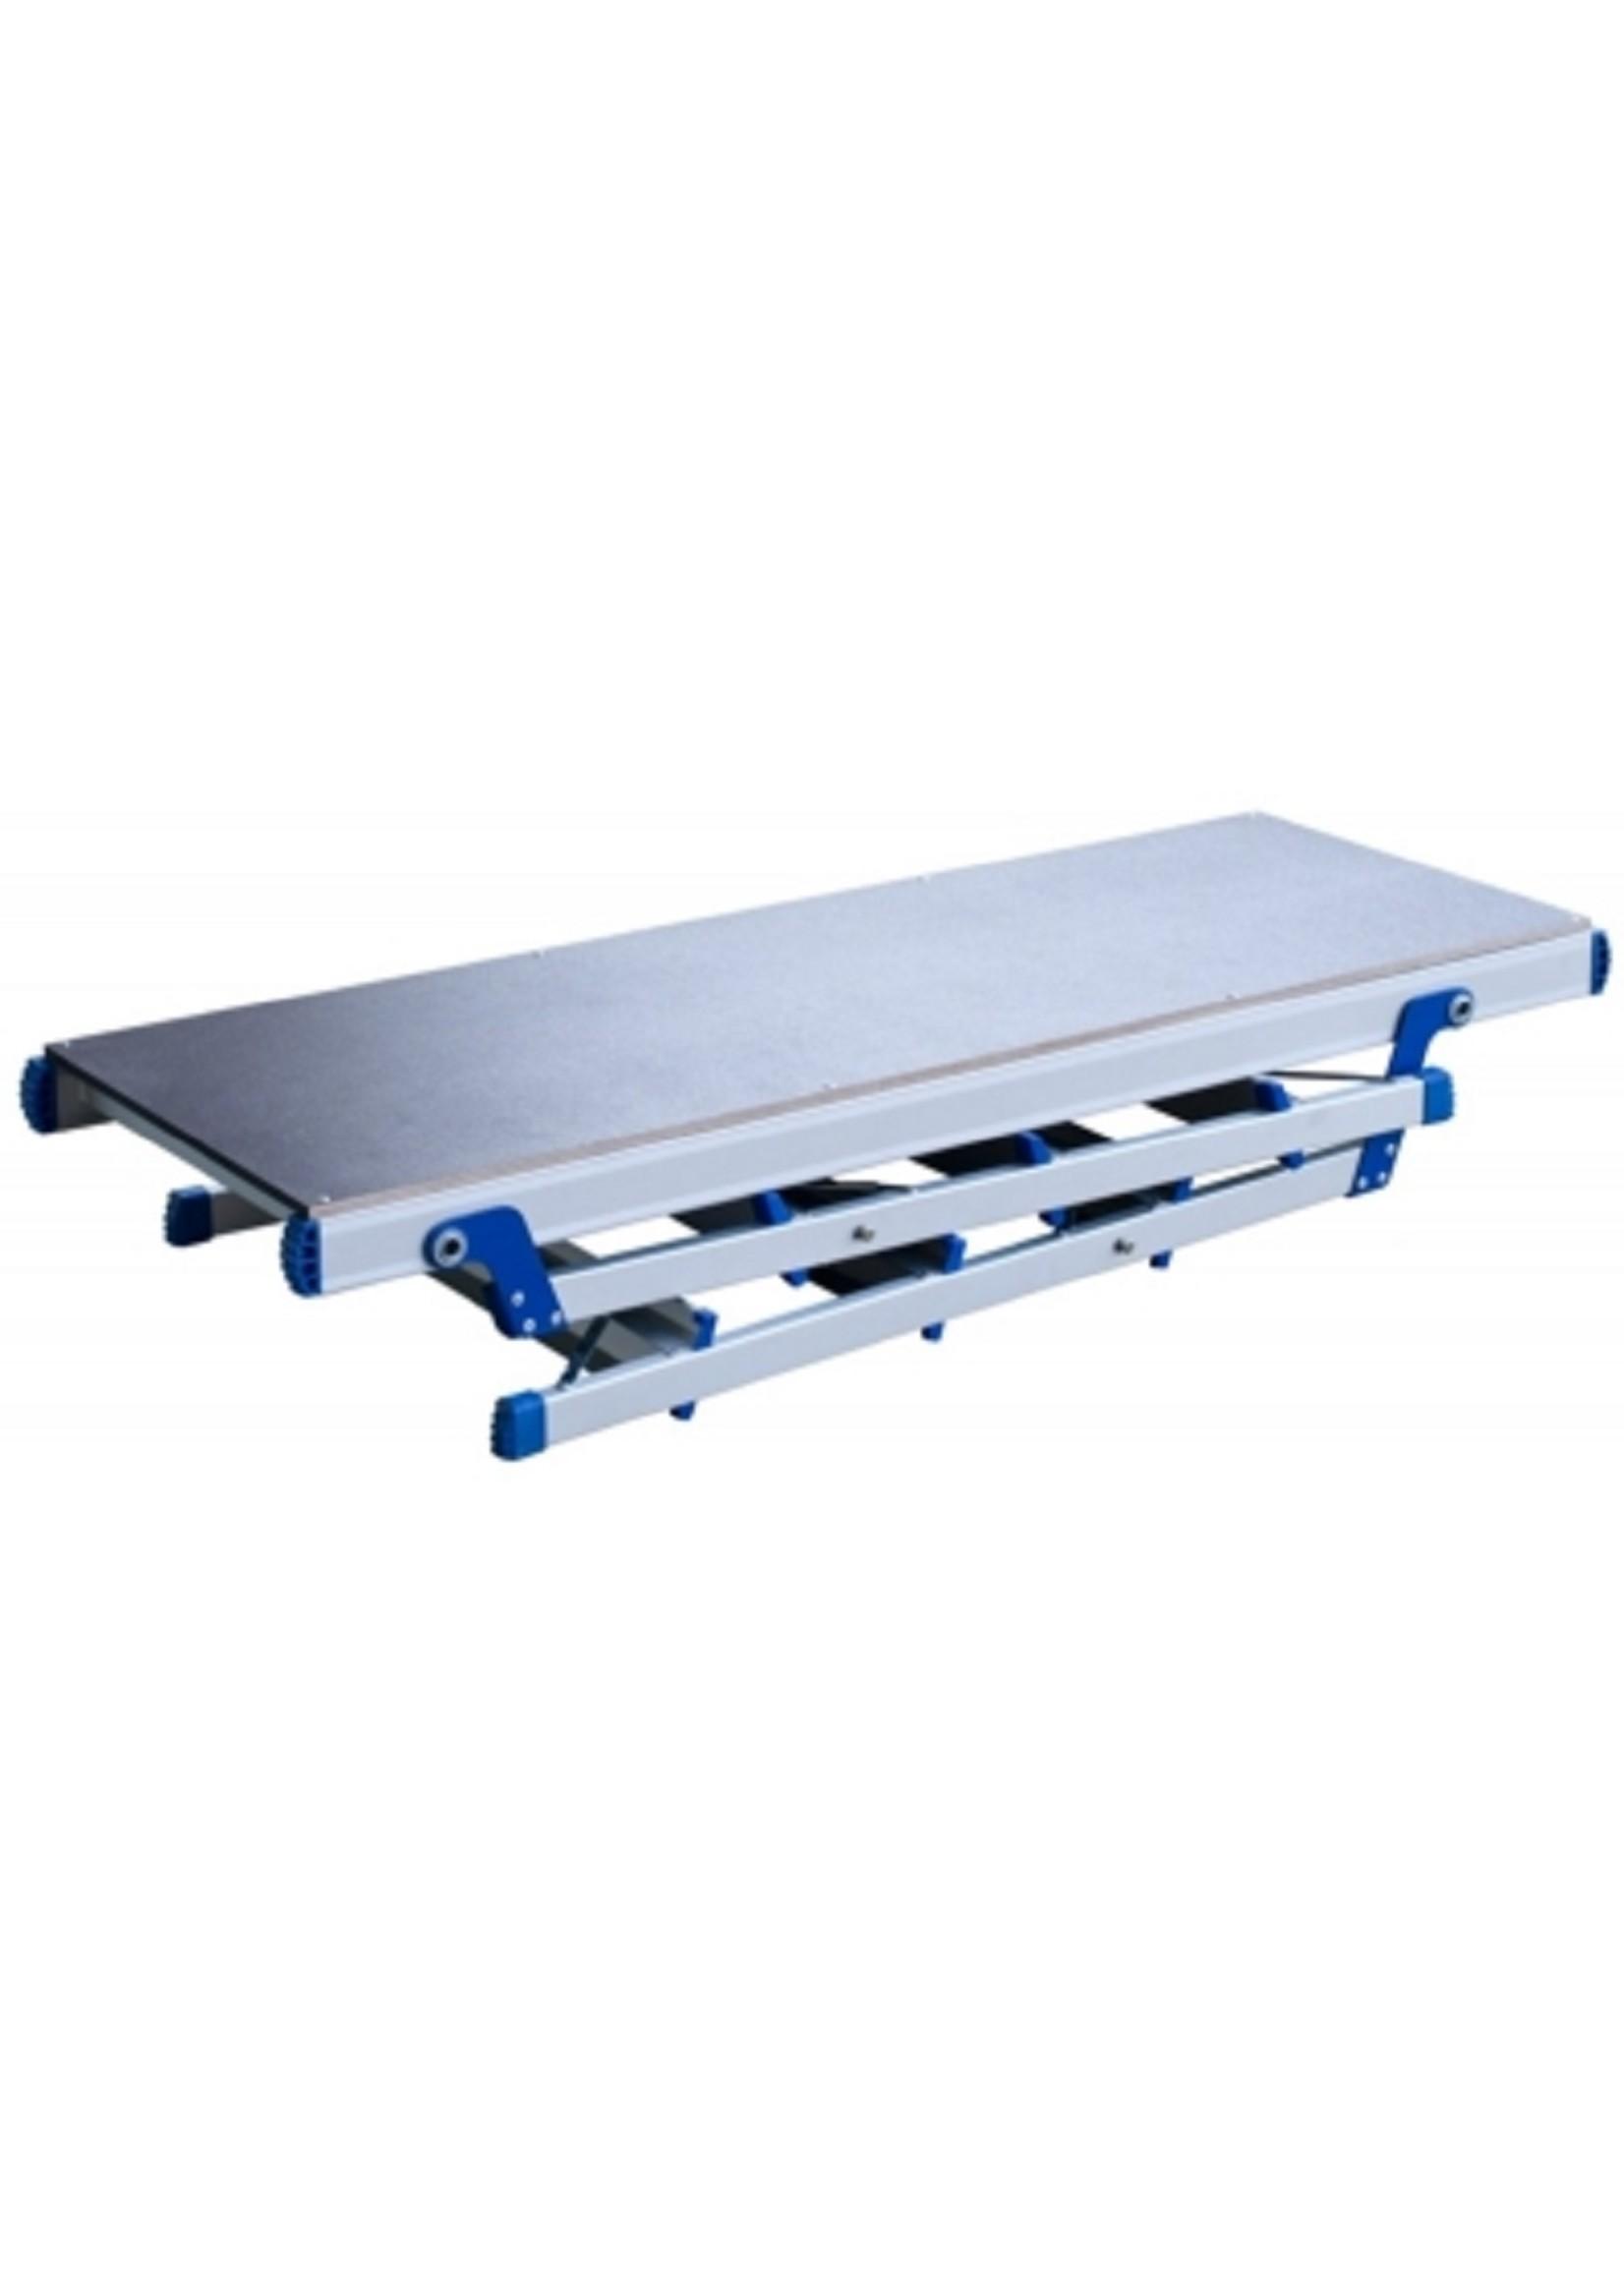 Spider & Co Aluminium inklapbaar werkplateau 124 x 45 x 92 cm (lxbxh) tot 150 kg